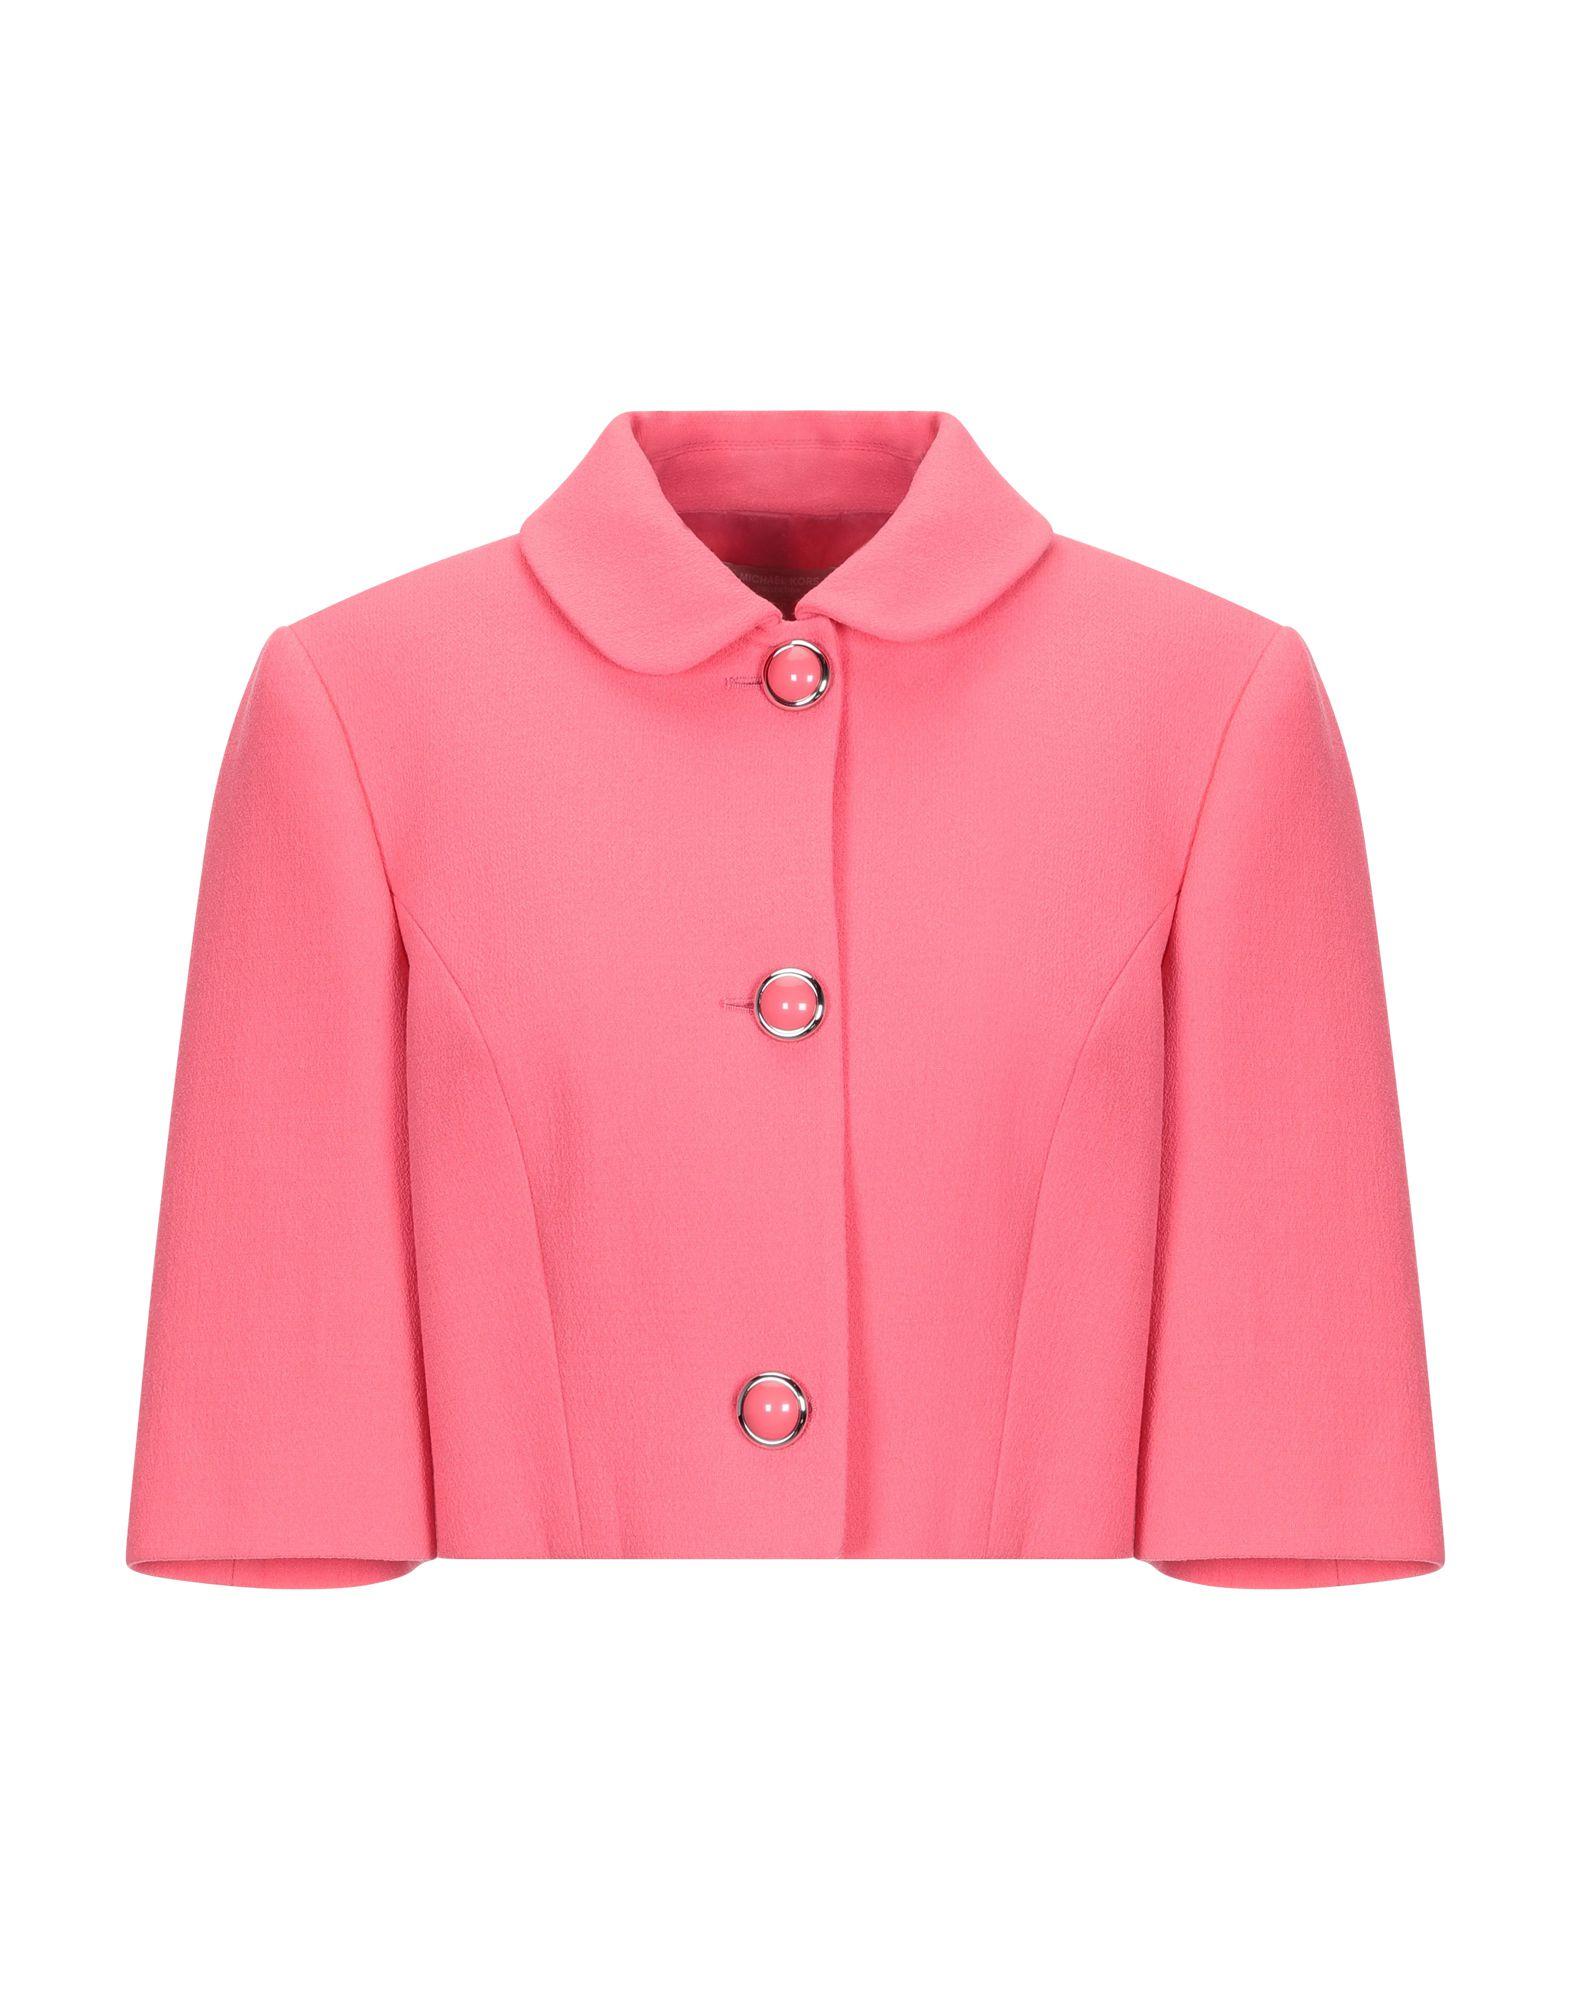 MICHAEL KORS COLLECTION Пиджак michael kors collection пиджак